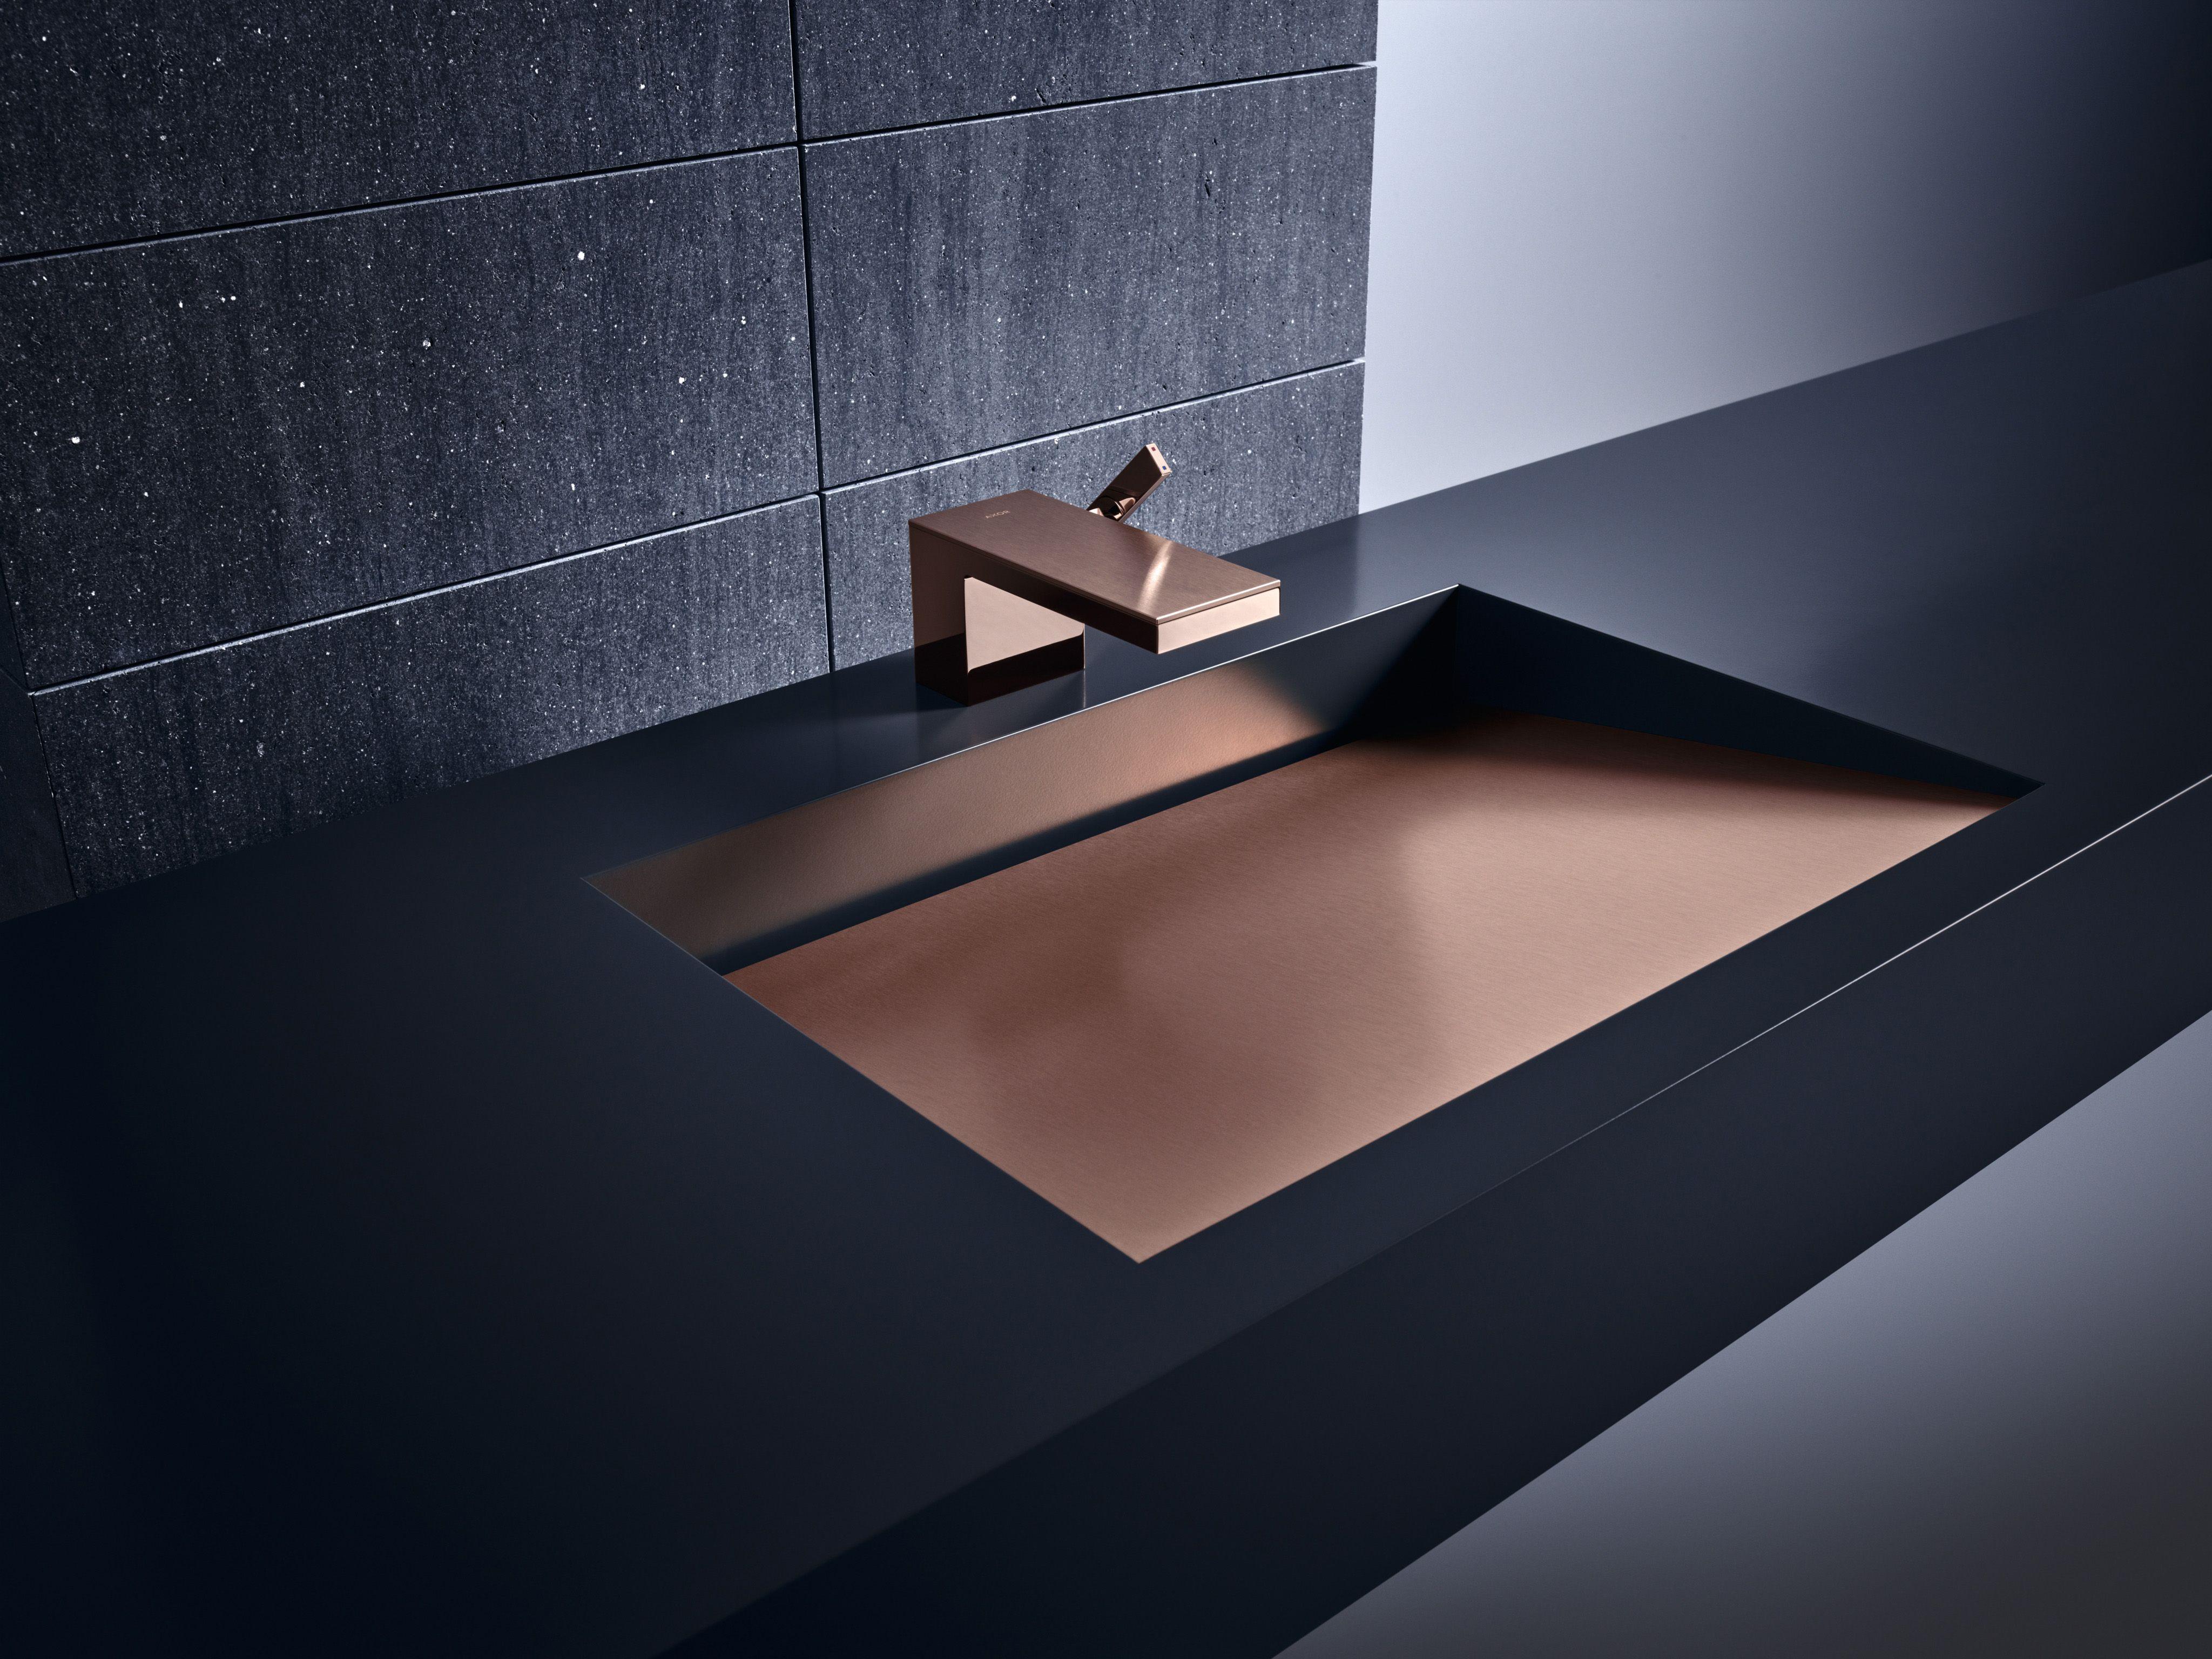 Salle De Bain Dax salle de bains : mitigeur lavabo (axor - my edition)   bath